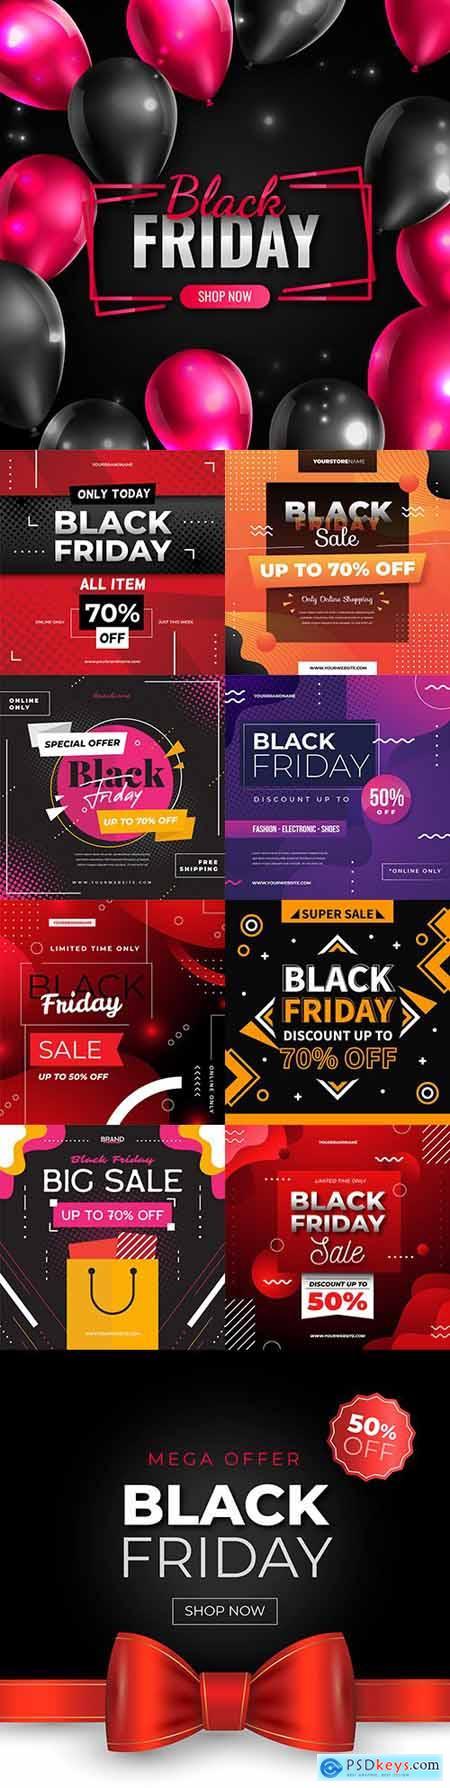 Black Friday and sale special design illustration 36